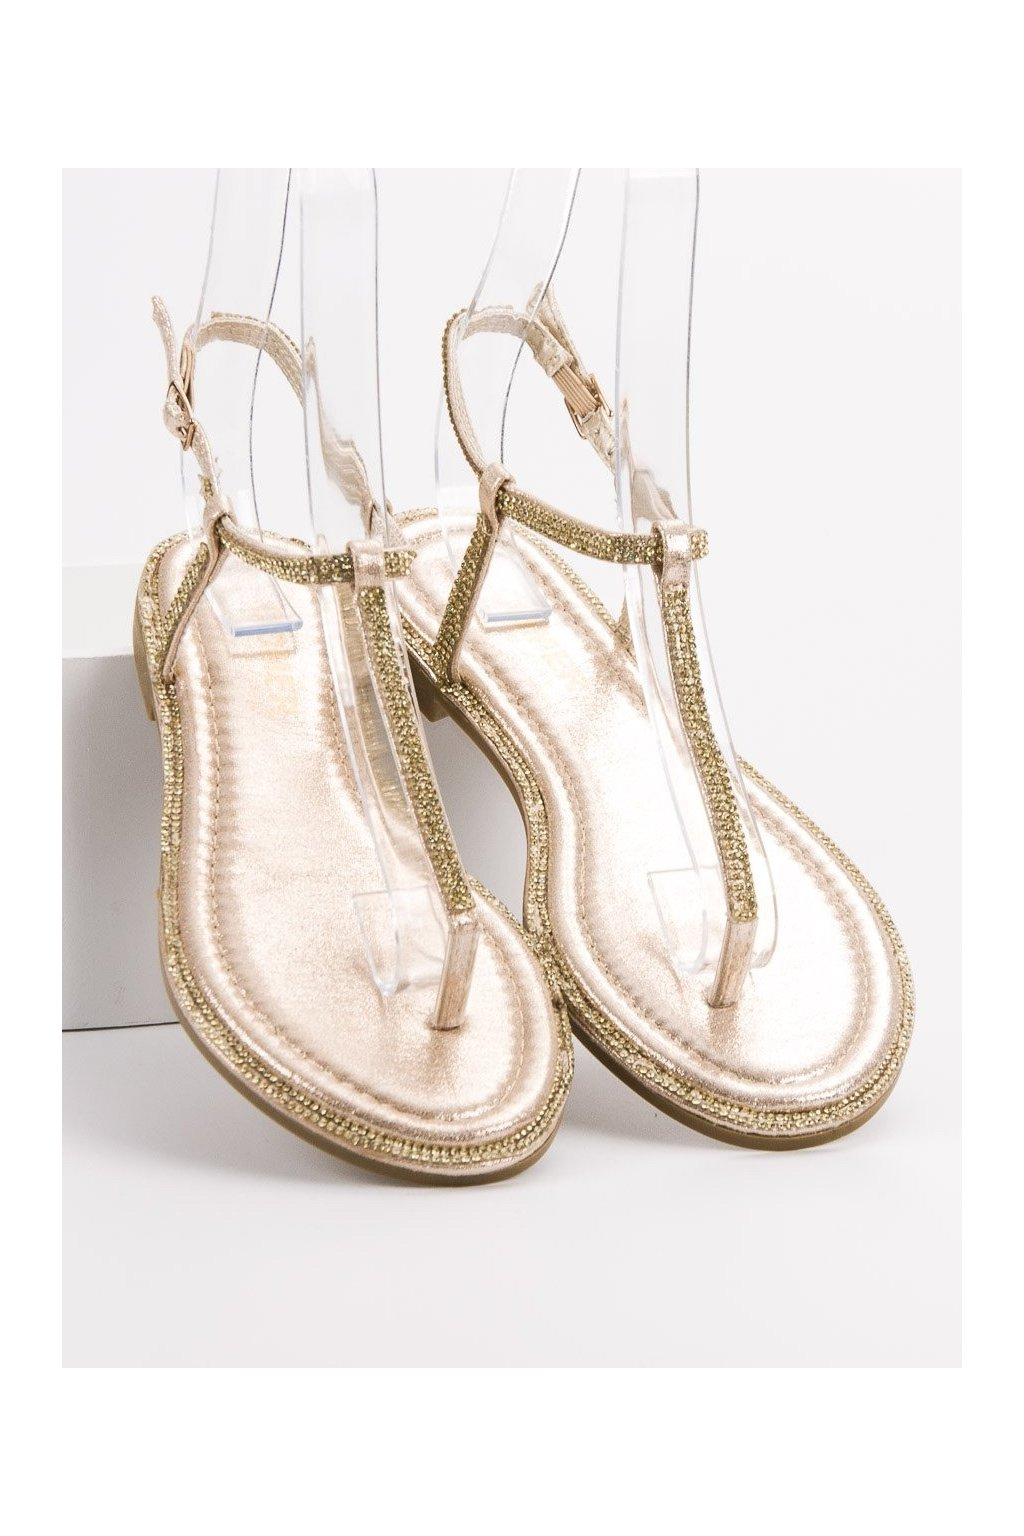 288932 damske zlate ploche sandale als015go big